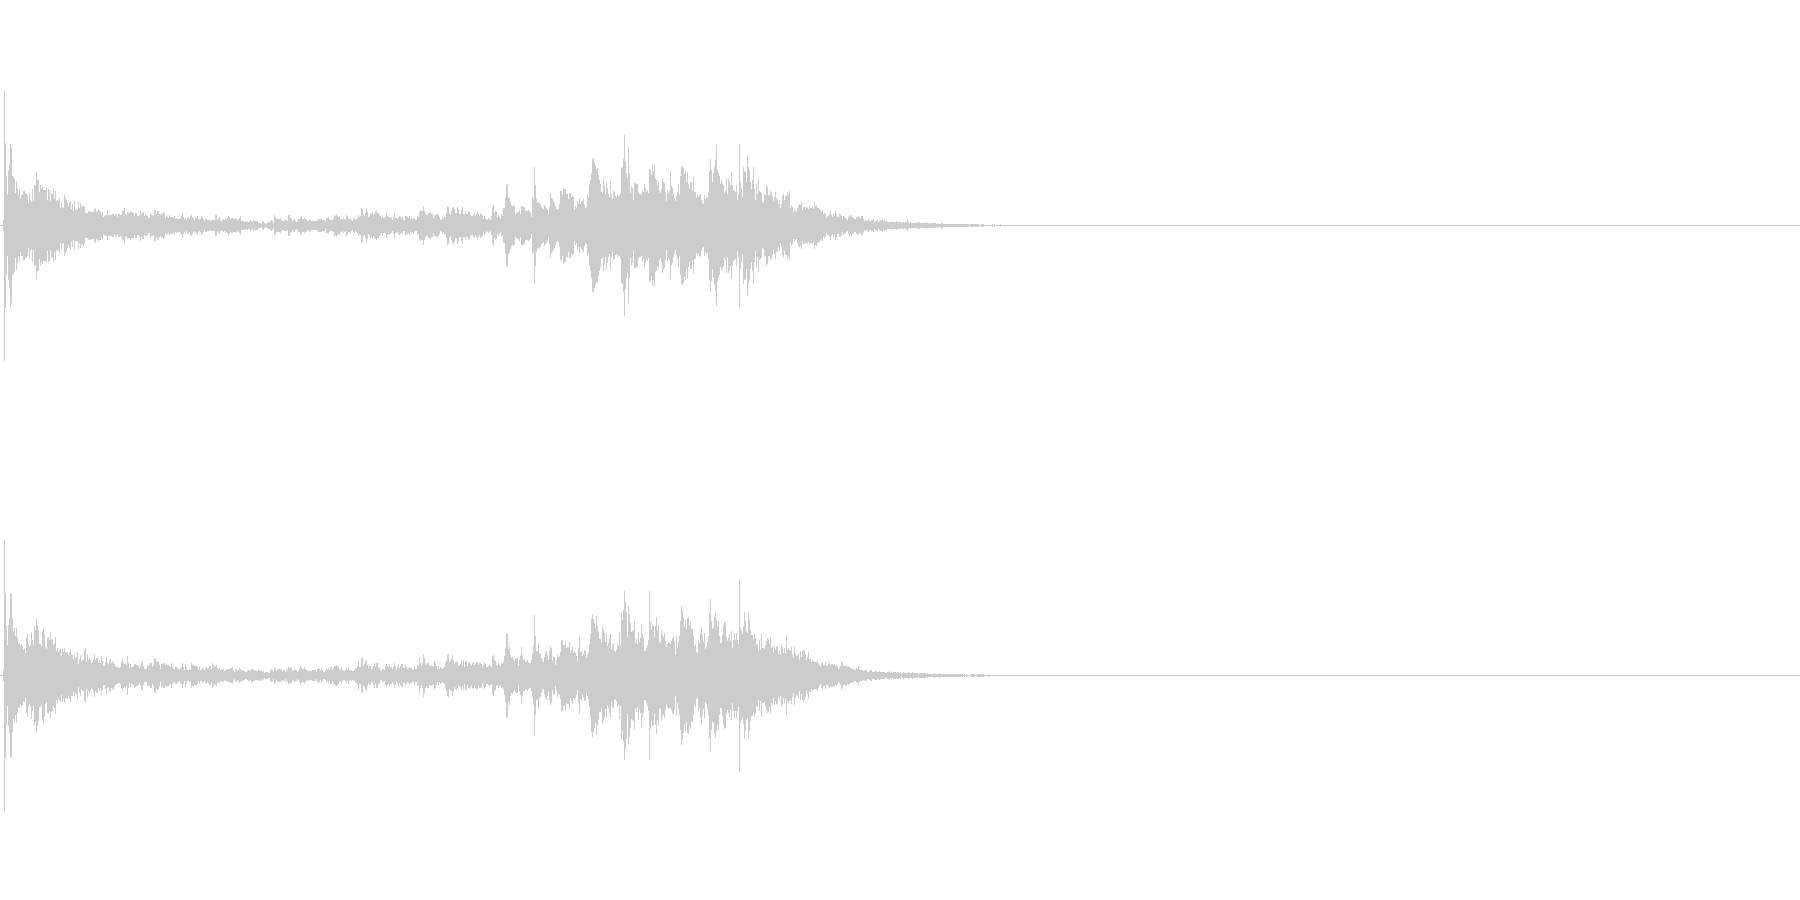 生演奏 琵琶 和風 古典風 残響有#17の未再生の波形